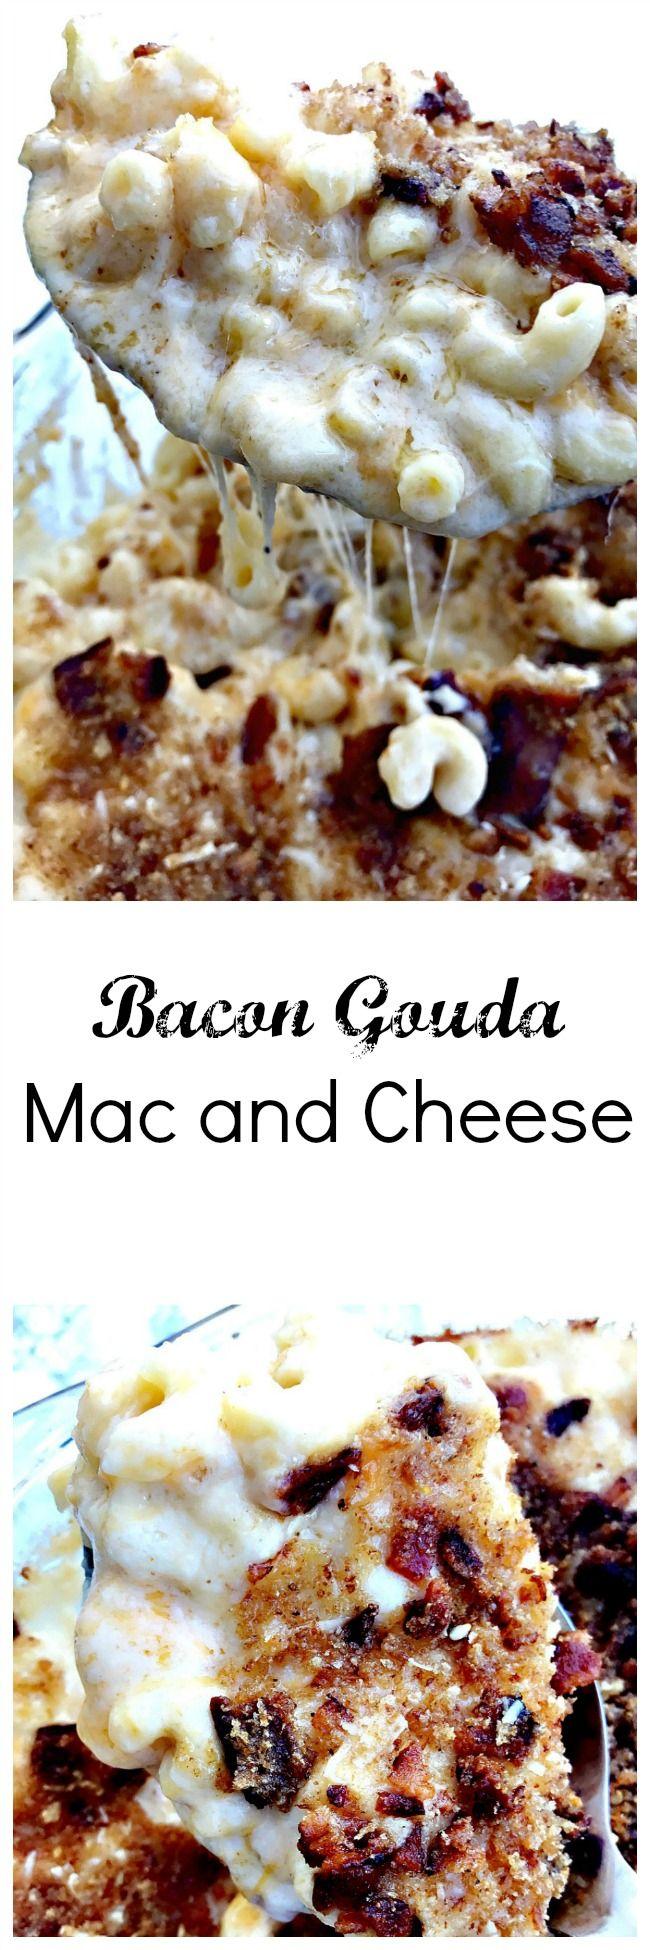 Bacon Gouda Mac and Cheese